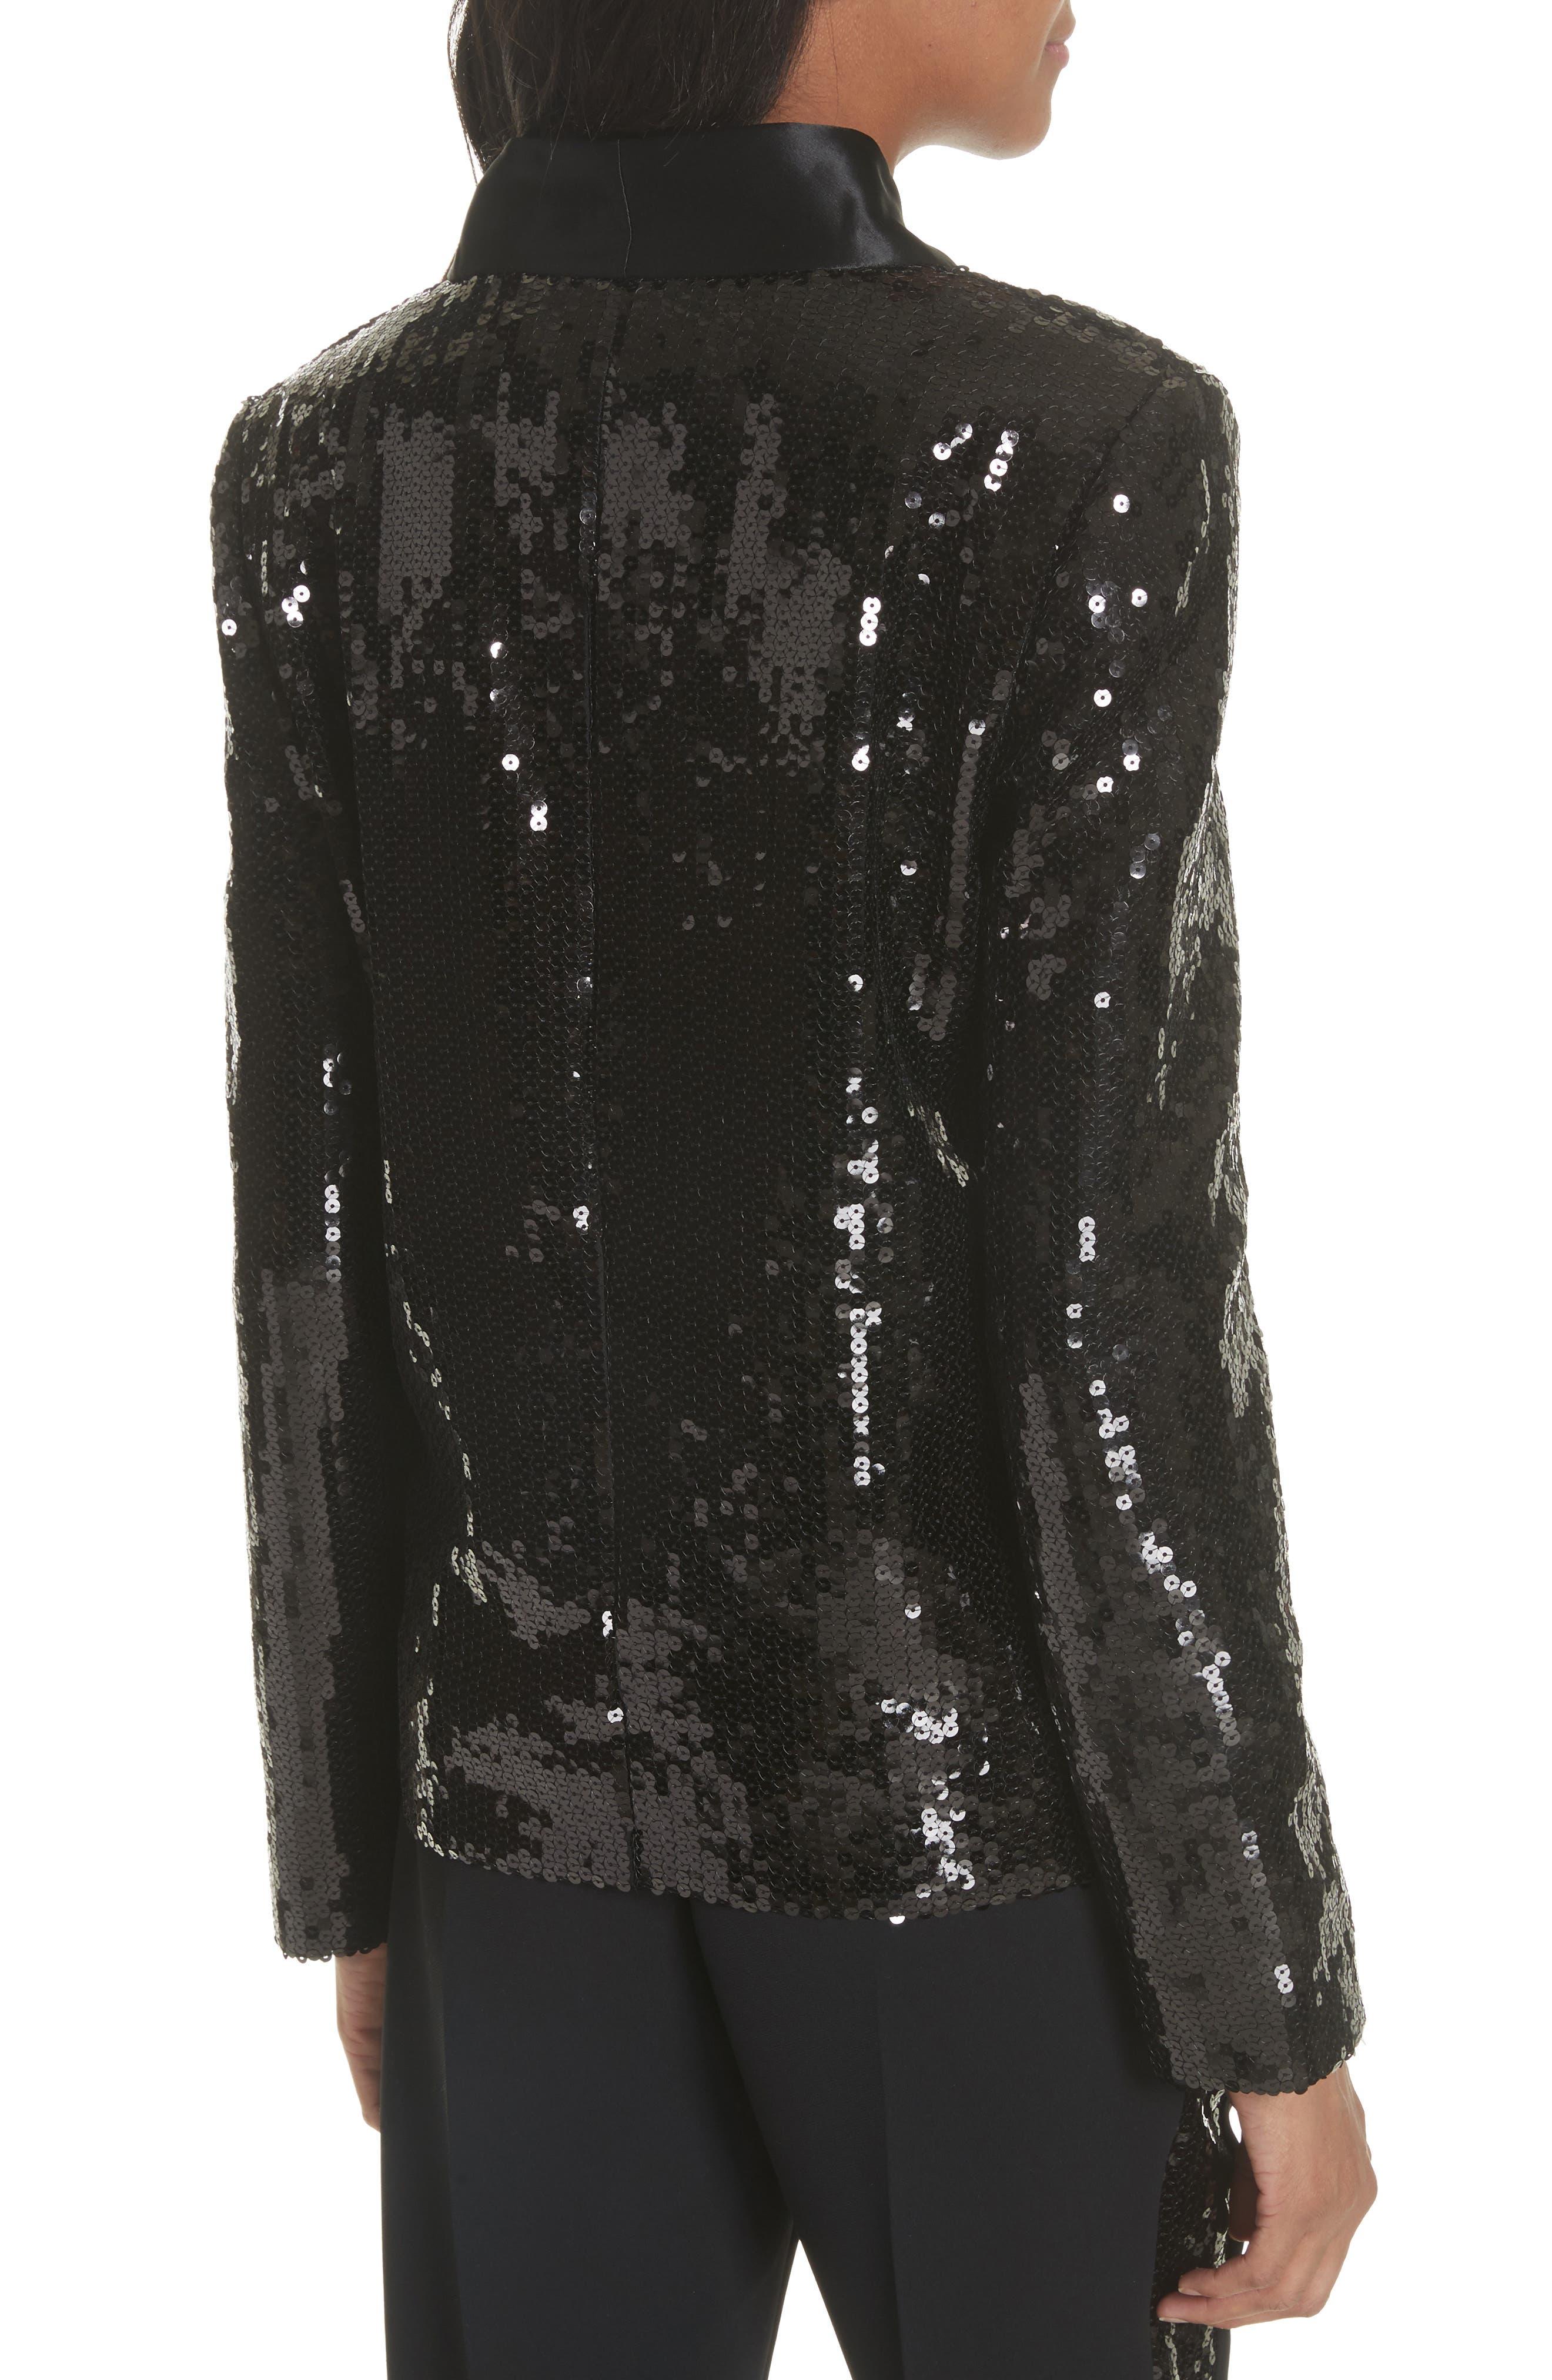 Sequin Tuxedo Jacket,                             Alternate thumbnail 2, color,                             Black